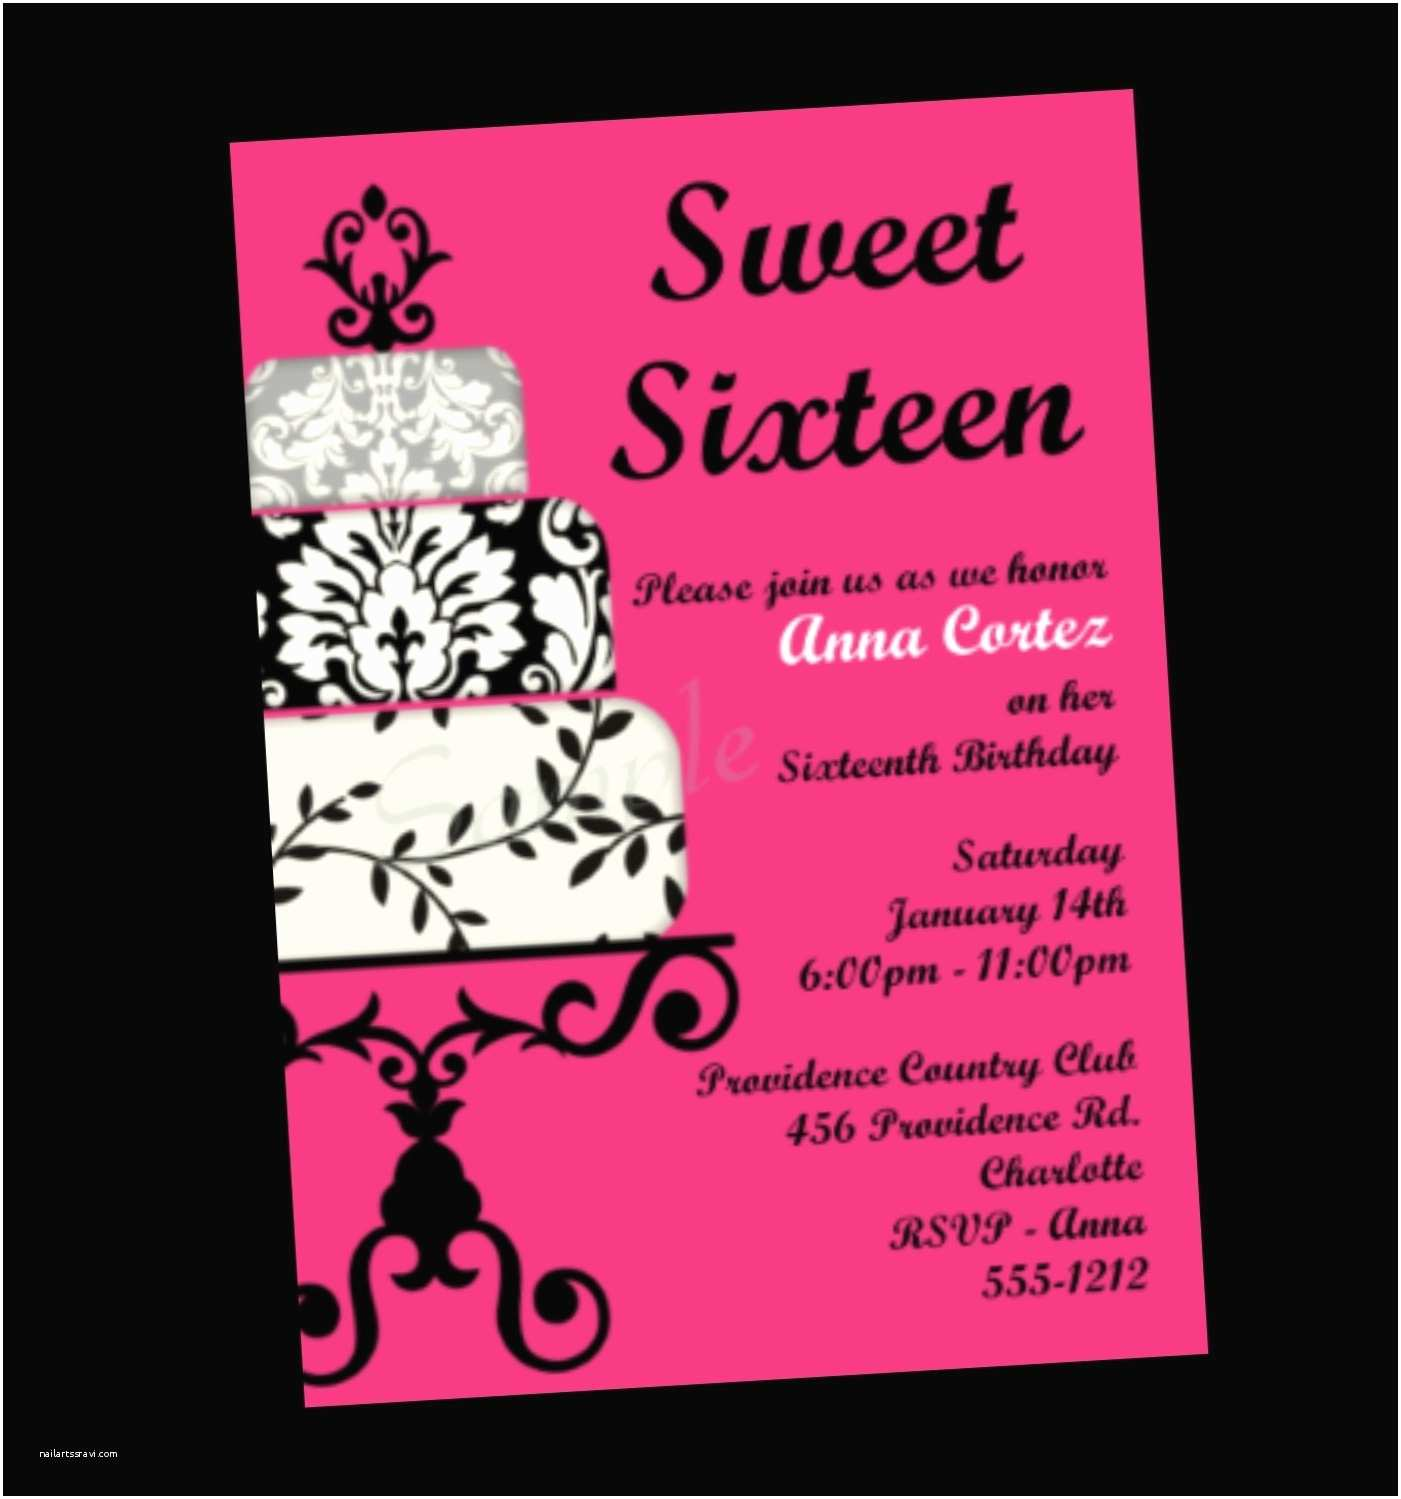 16th Birthday Invitations Sweet 16 Birthday Invitation Sweet Sixteen Party by